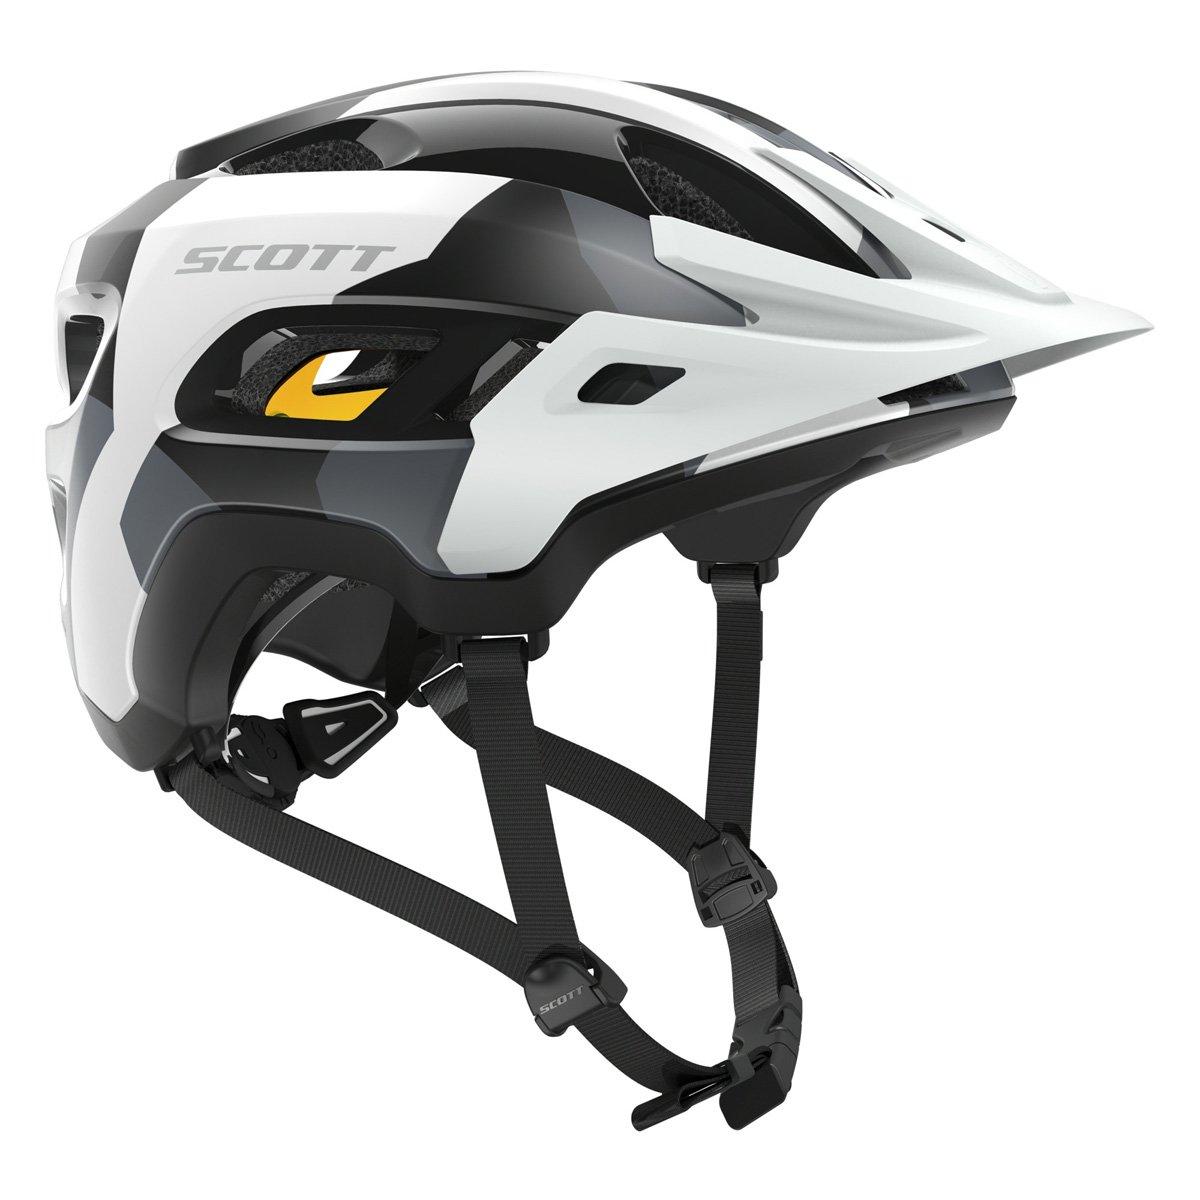 Scott Sports 2016 Stego CPSC Mountain Bicycle Helmet 227654